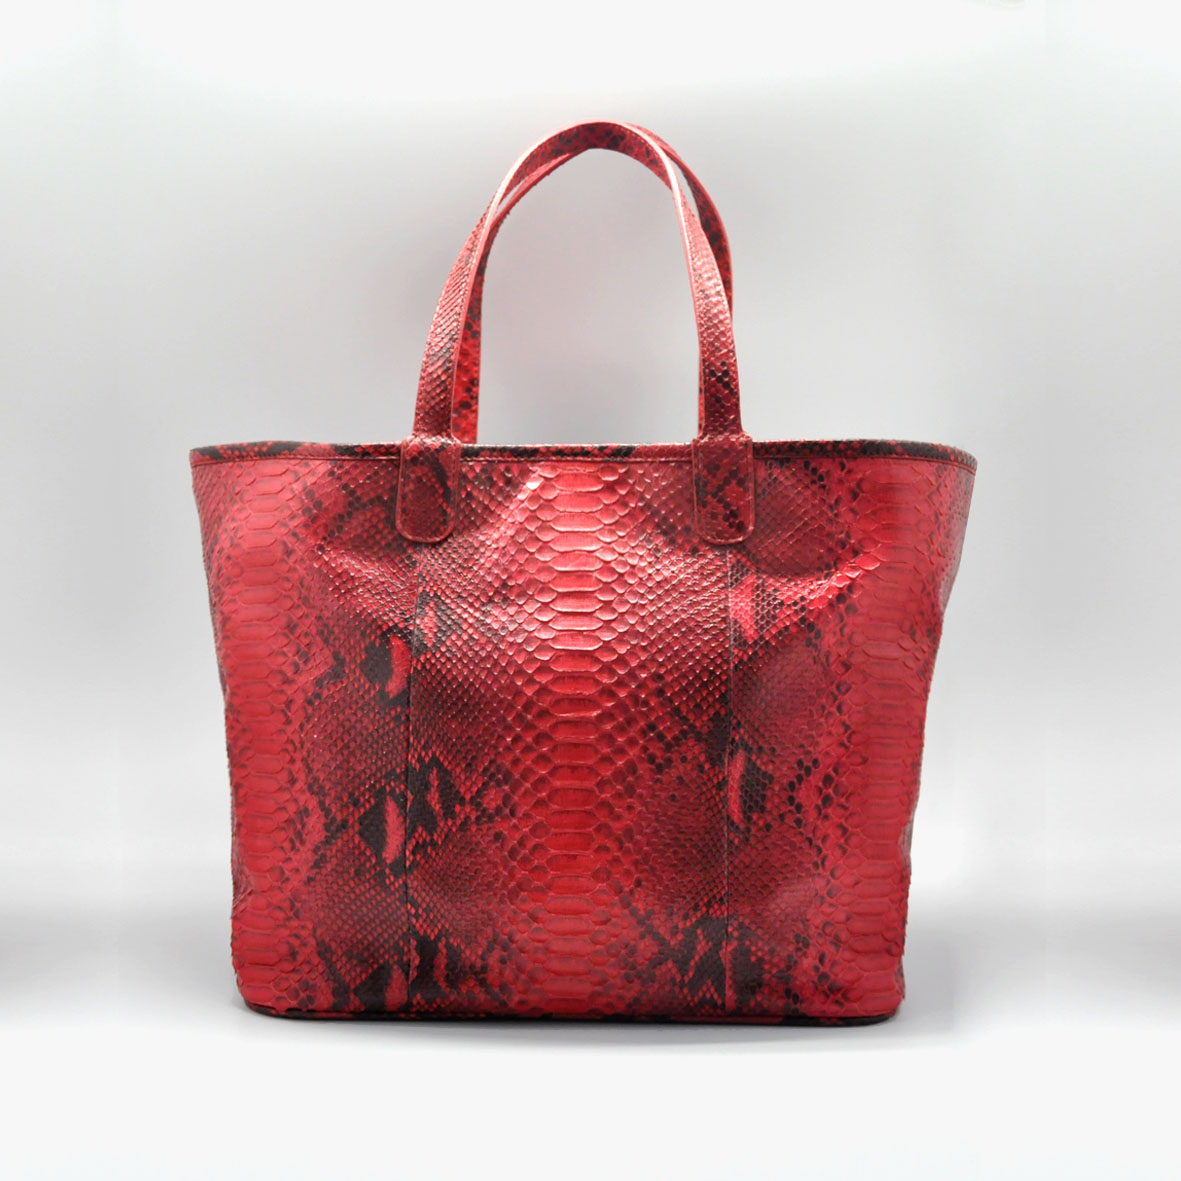 Tote Bag - Python Skin